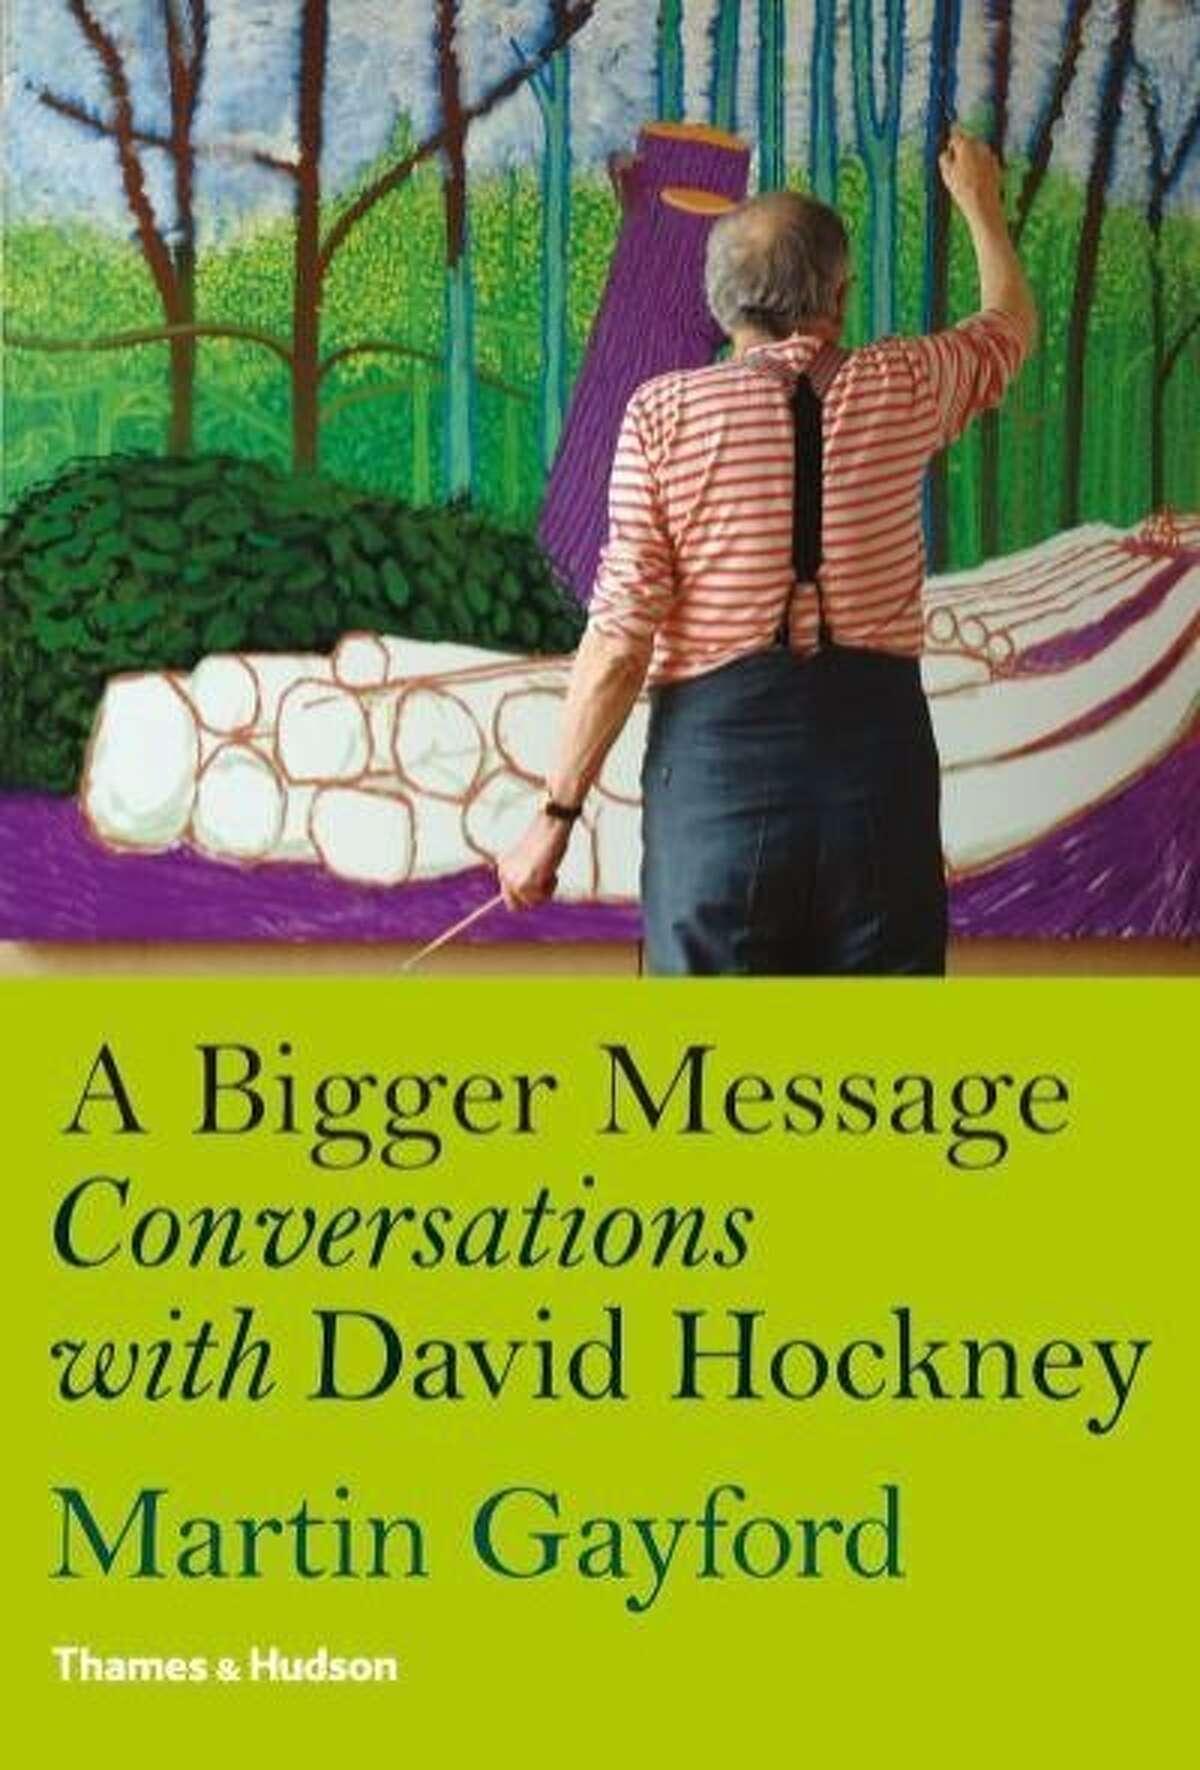 """A Bigger Message: Conversations With David Hockney"" by Martin Gayford"